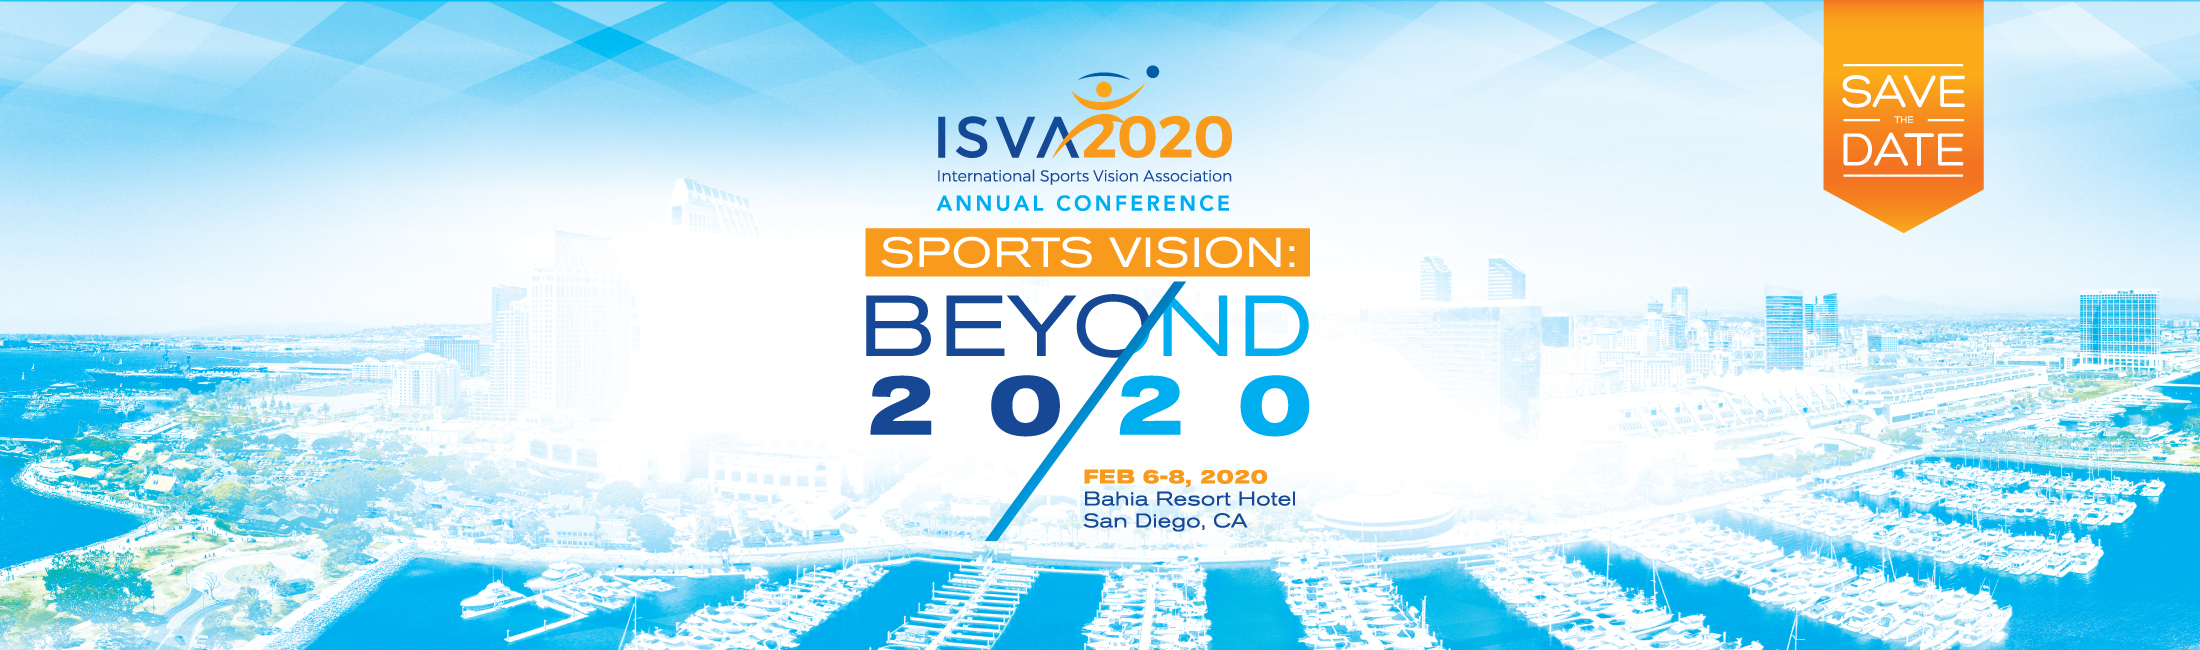 ISVA_2020Annual_WebBanner_2200x650